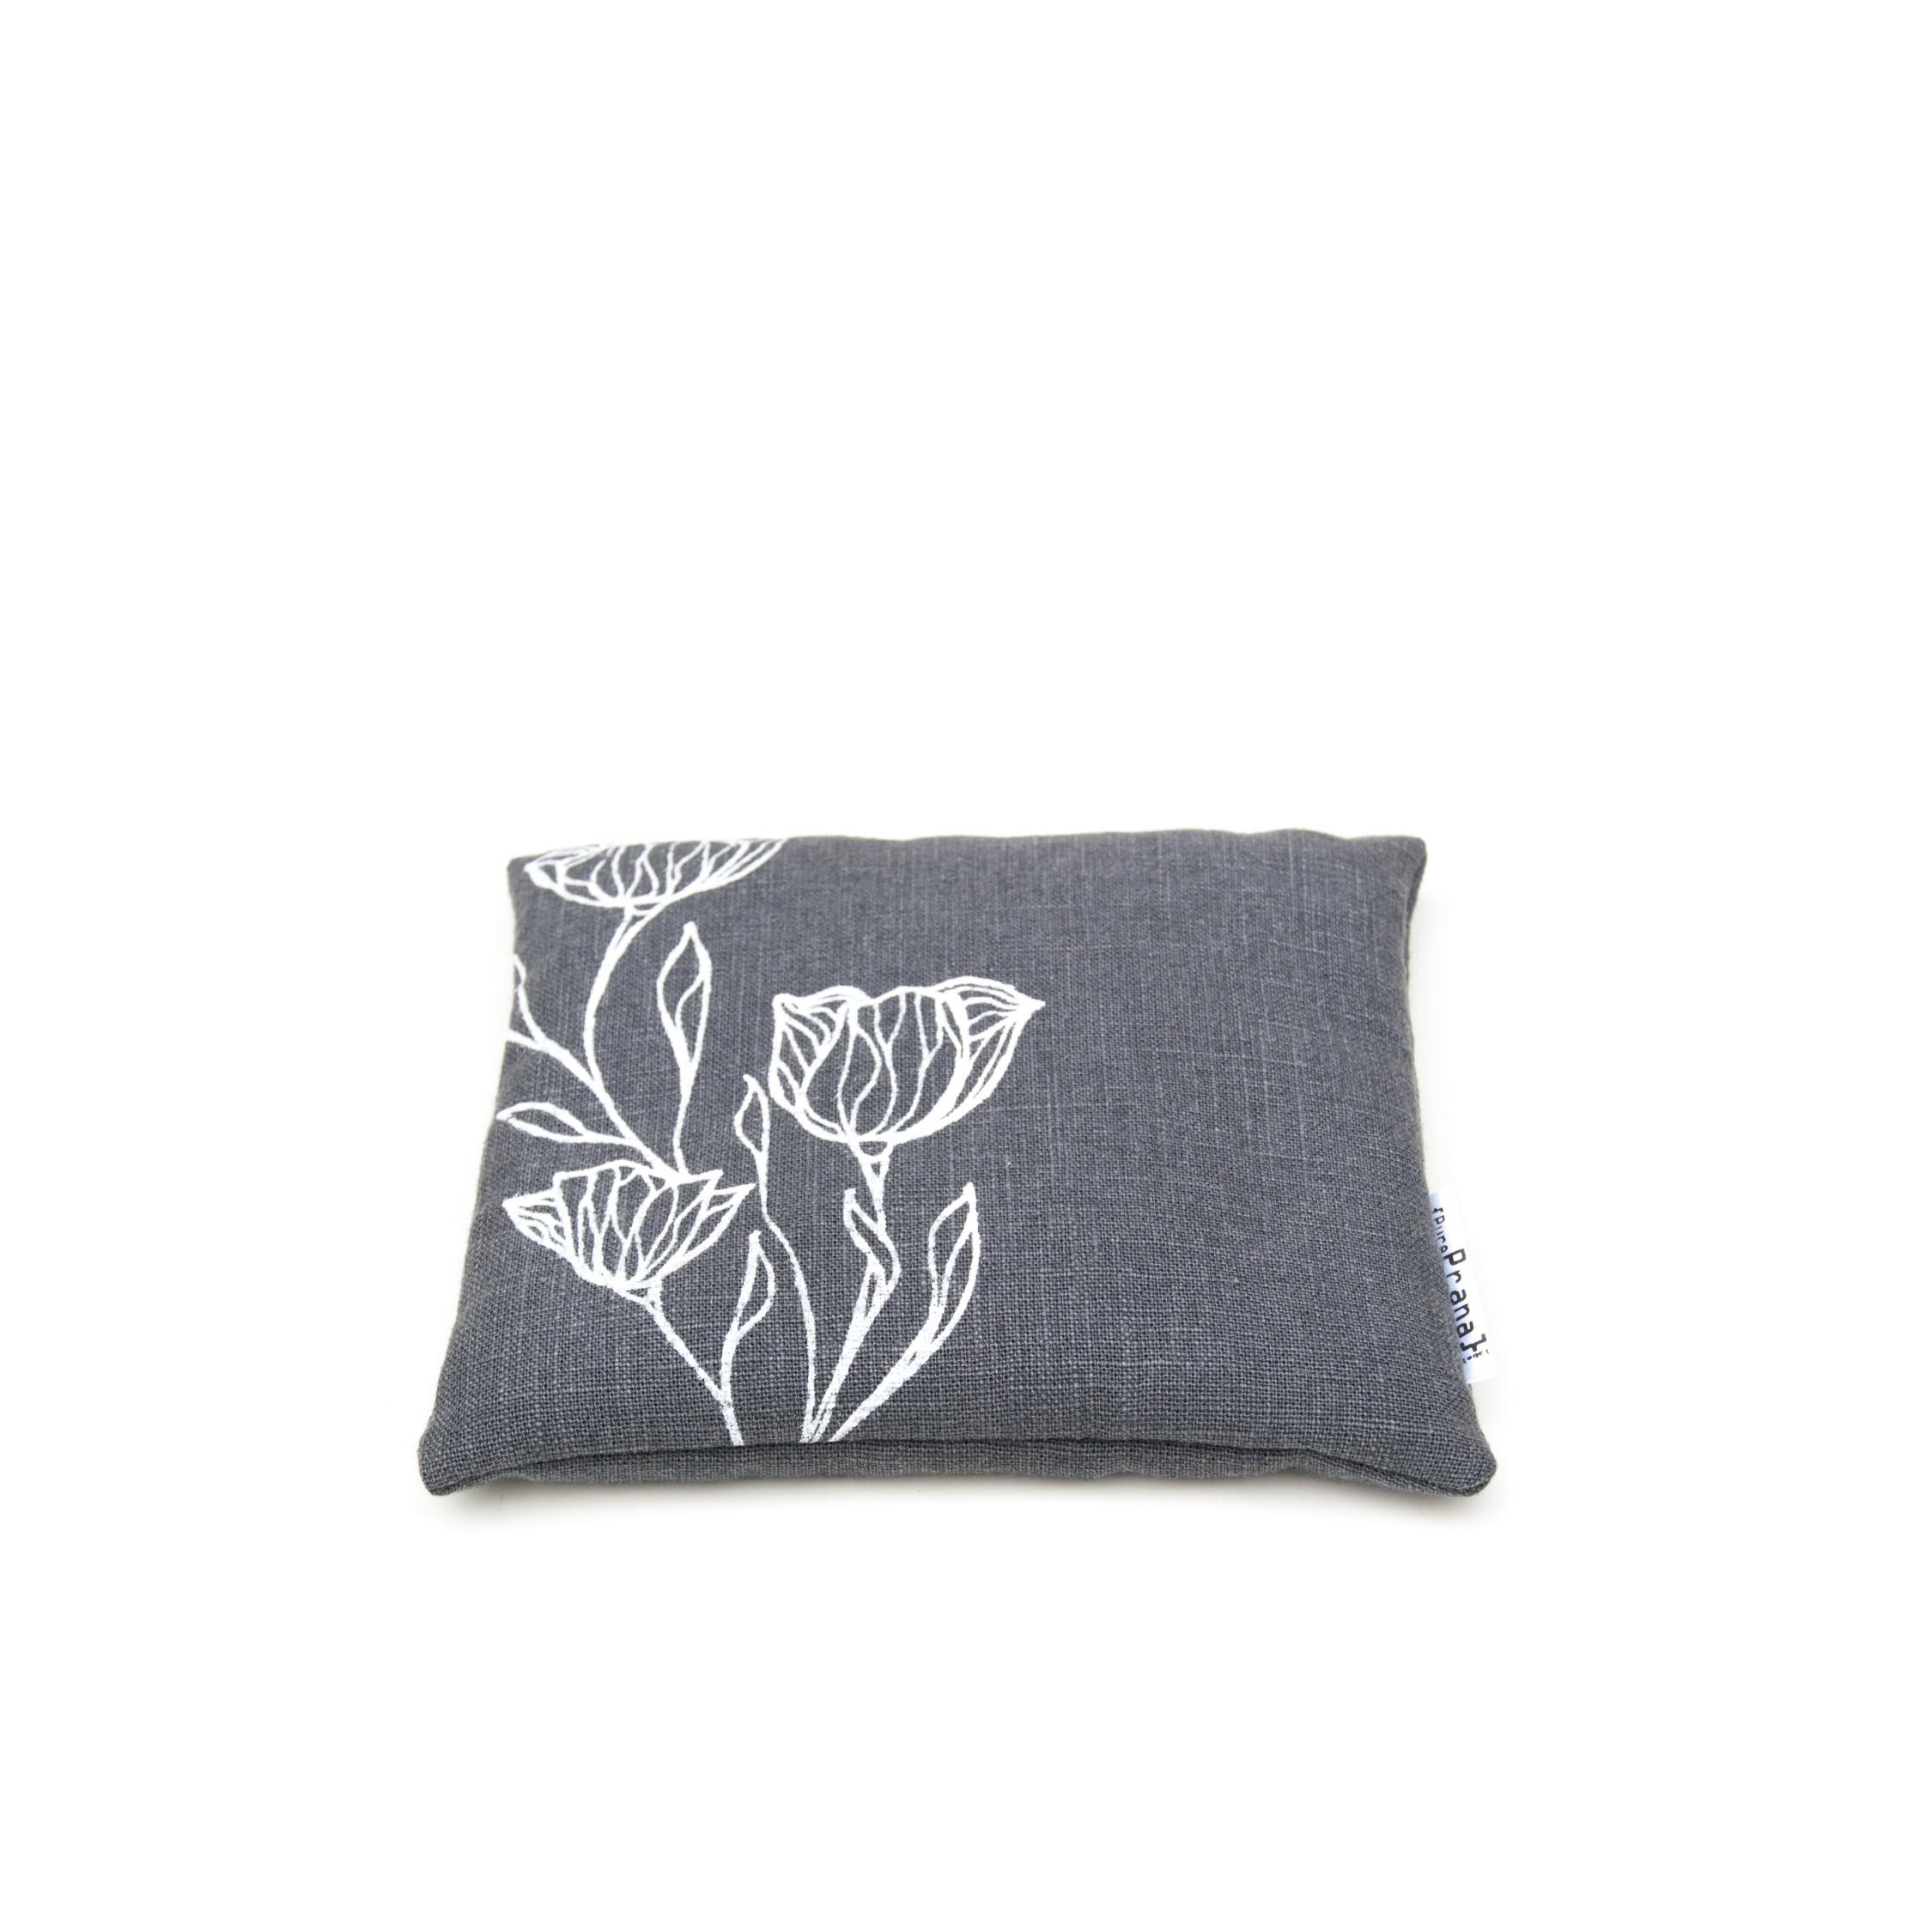 Singing bowl cushion in dark grey flax linen